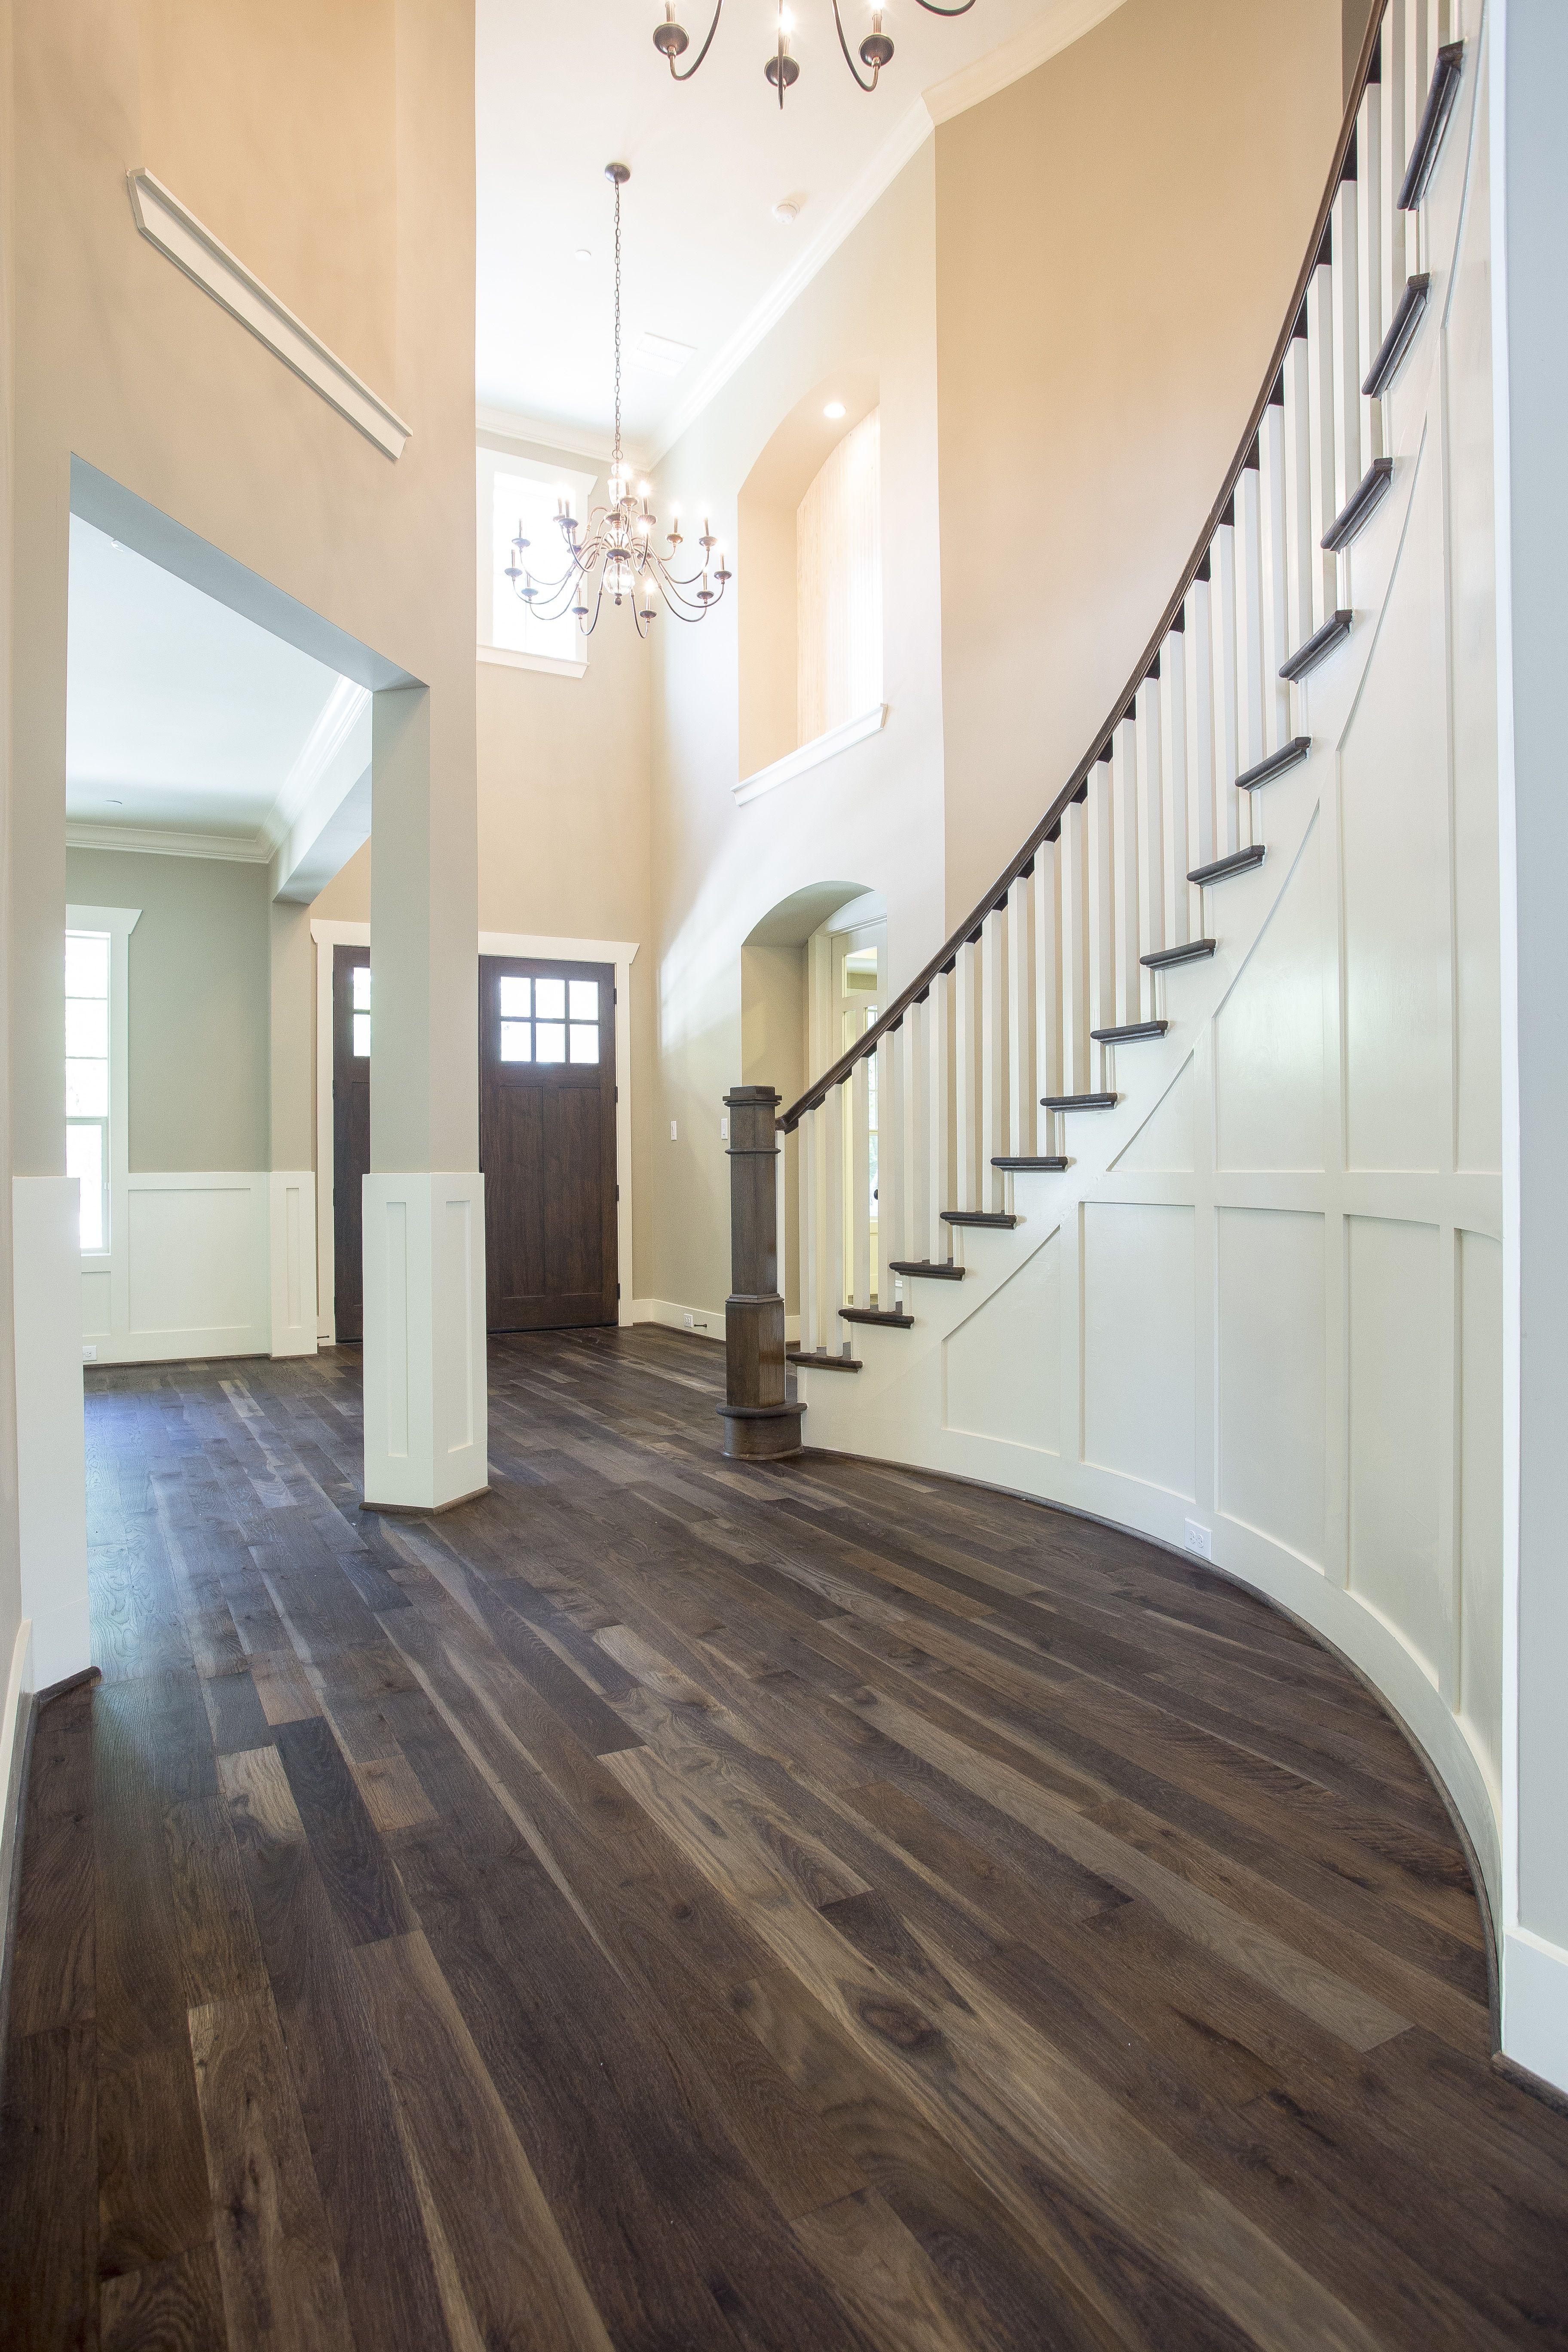 3 1 4 unfinished hardwood flooring of maxwell hardwood flooring inc mhfinc on pinterest for eaaf87607a9d381a976664af2ba07569